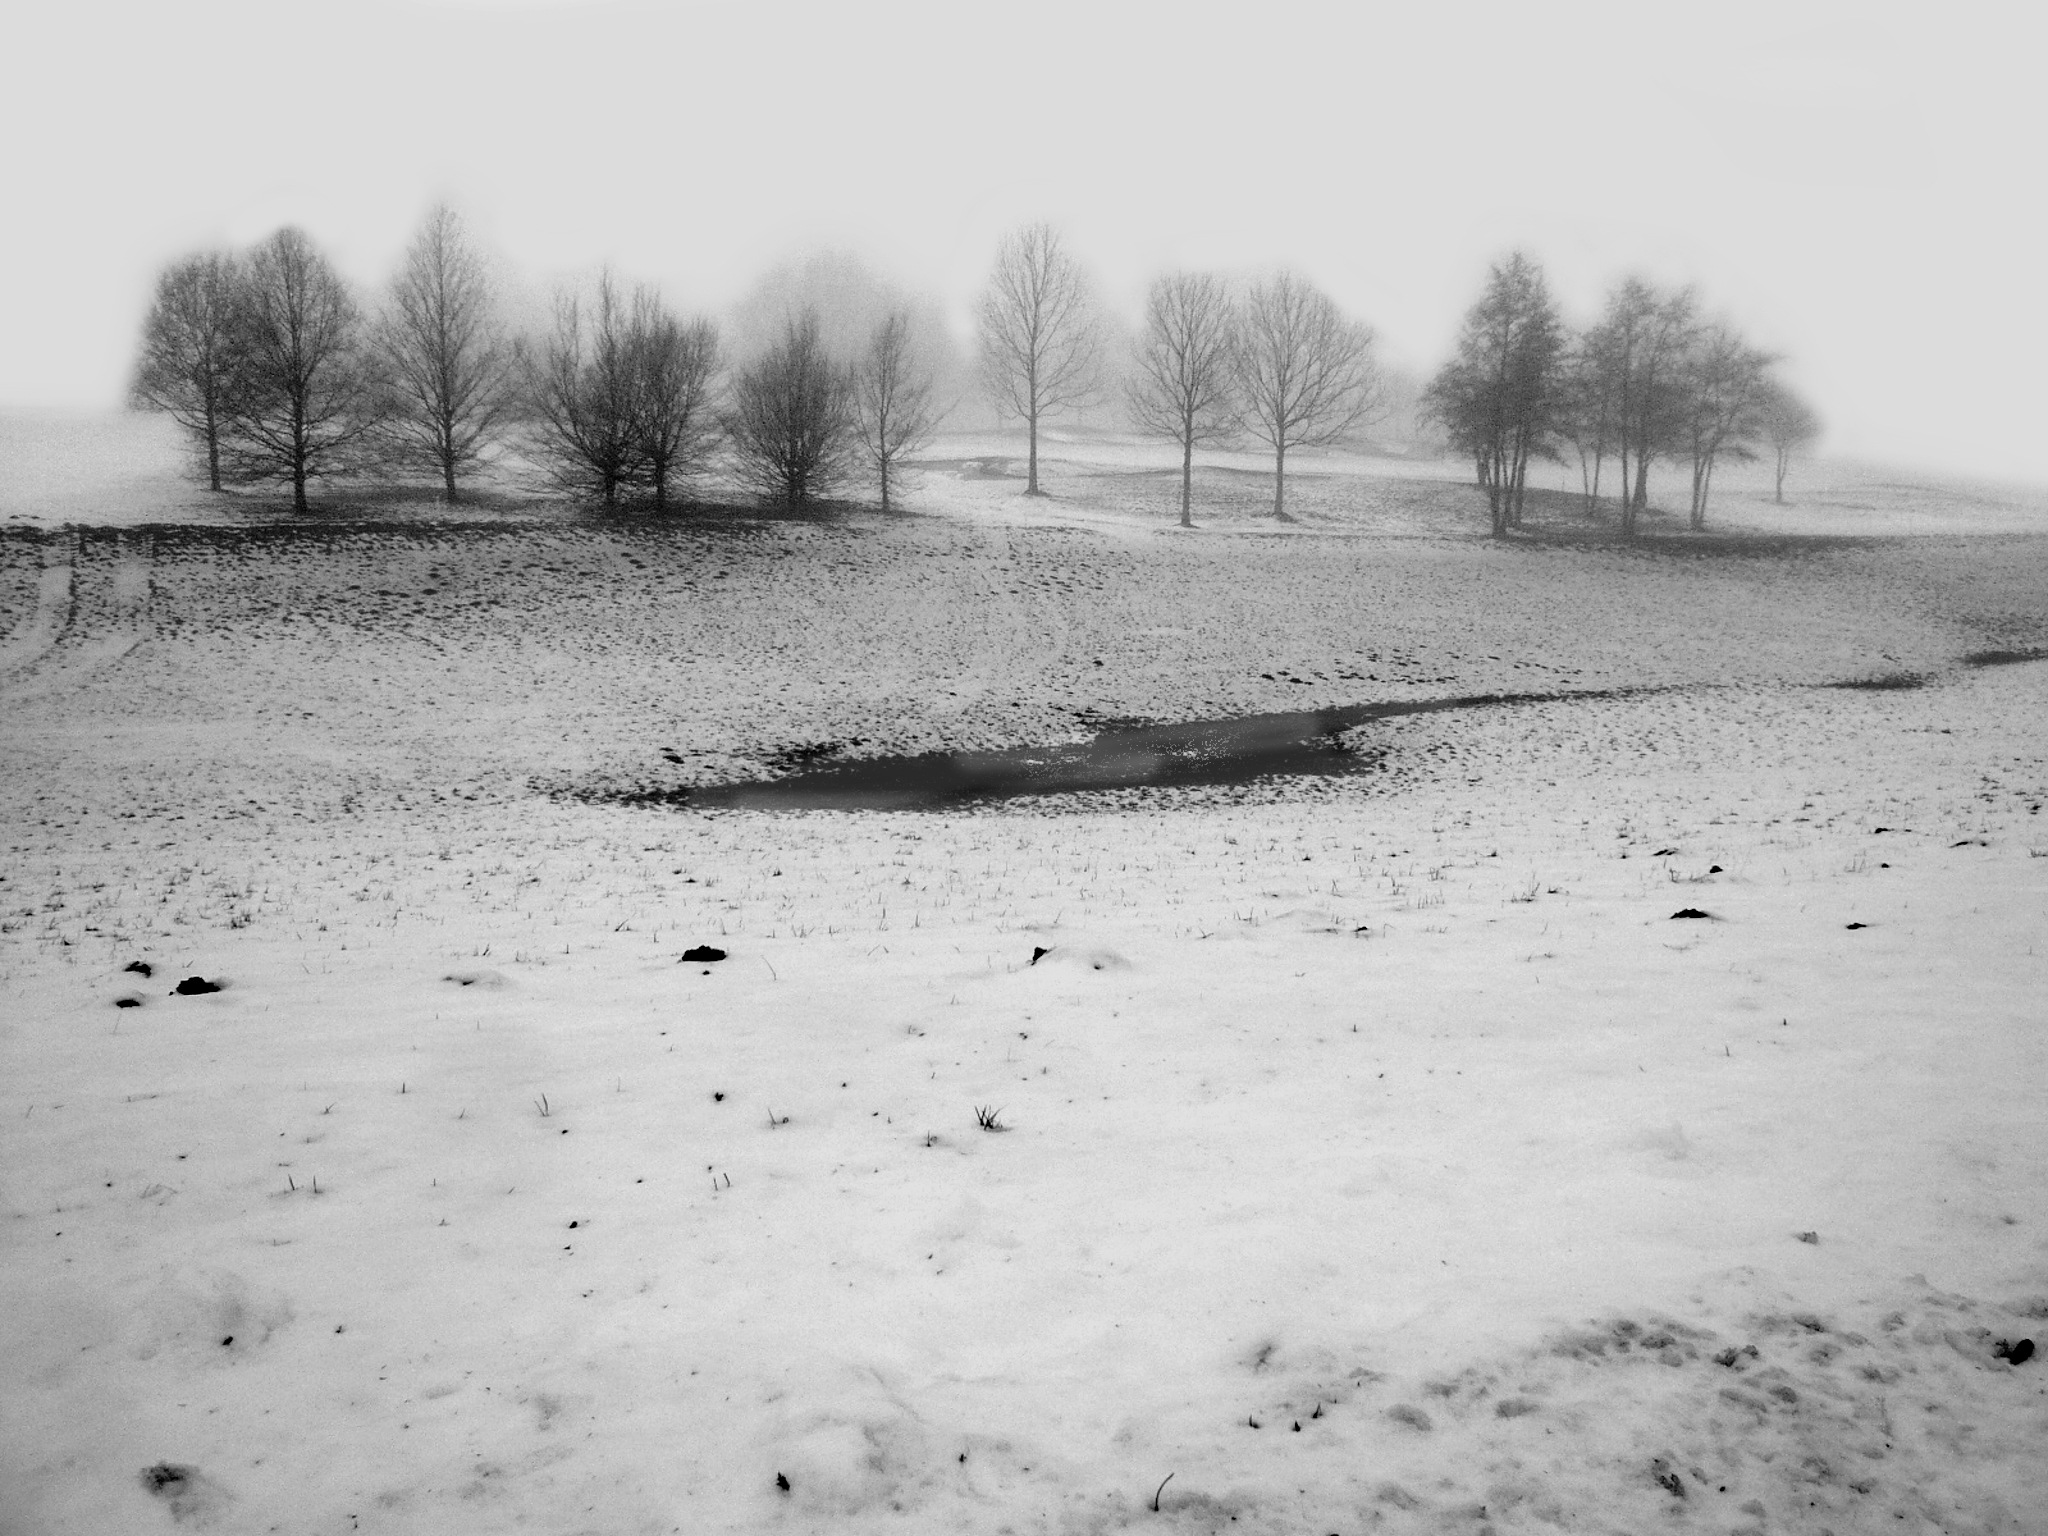 Winter landscape by Gernot Schwarz